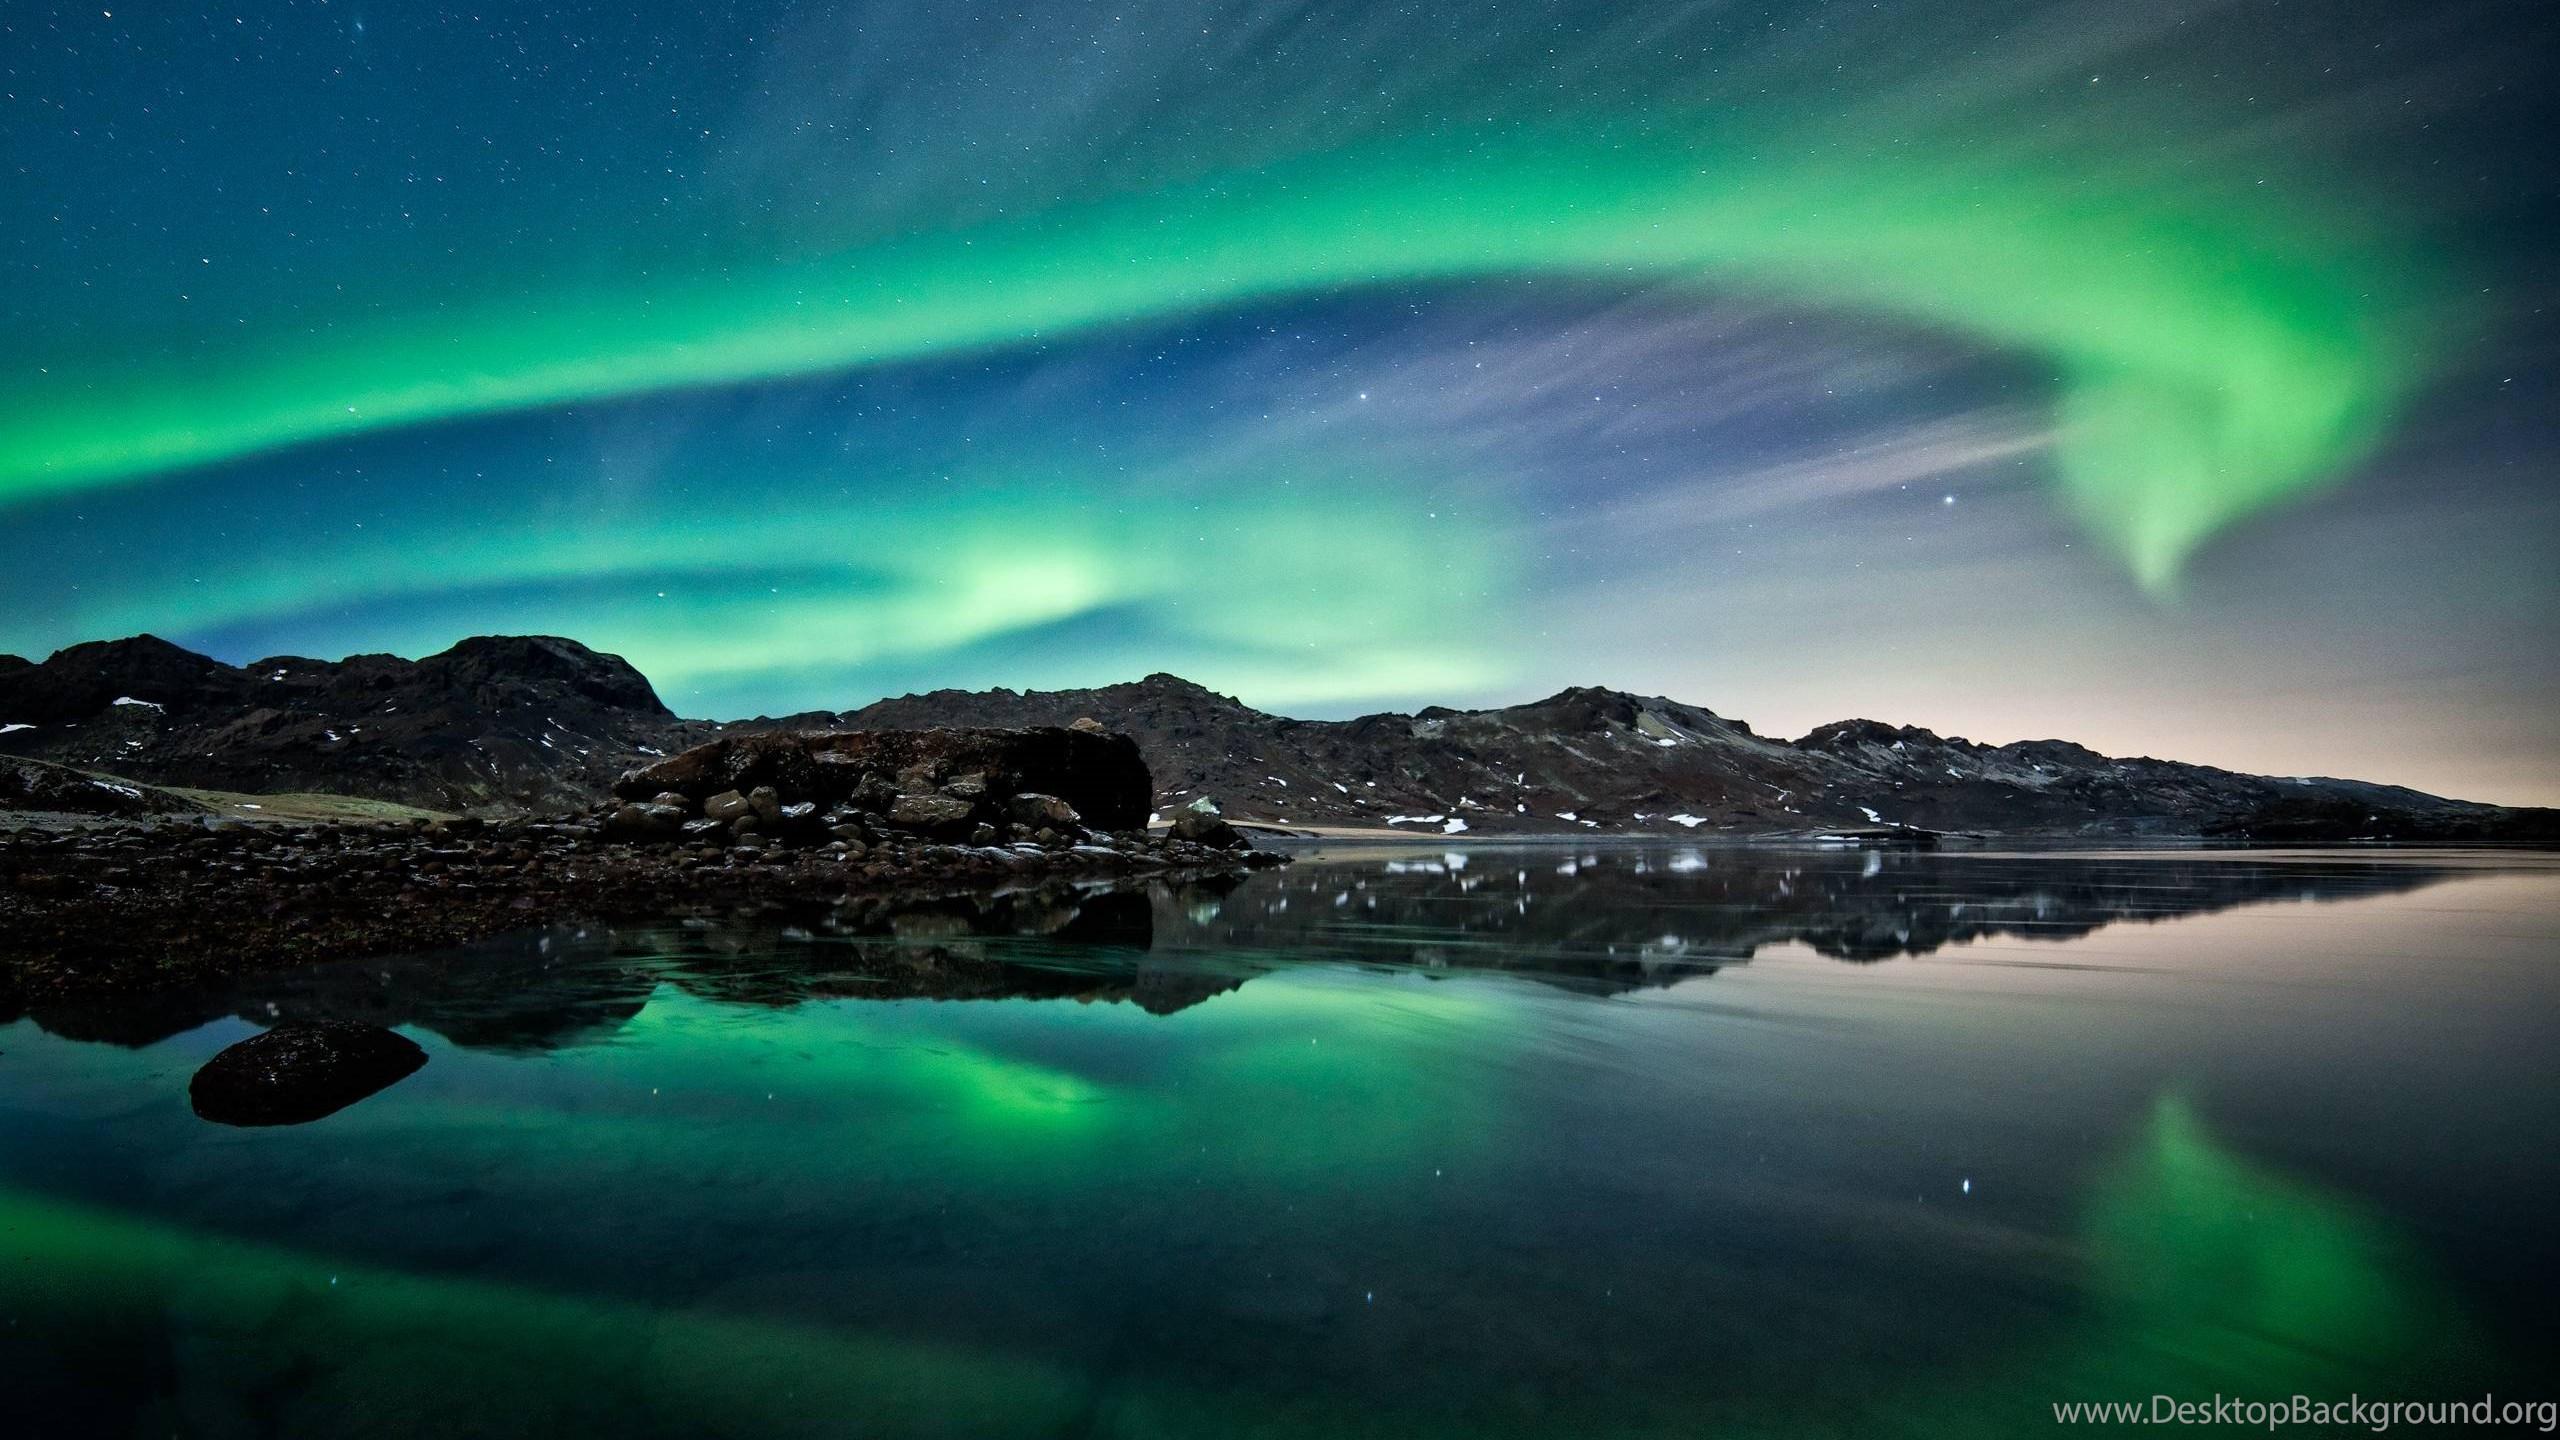 Northern Lights Iceland Aurora Borealis Hd Wallpapers Desktop Background